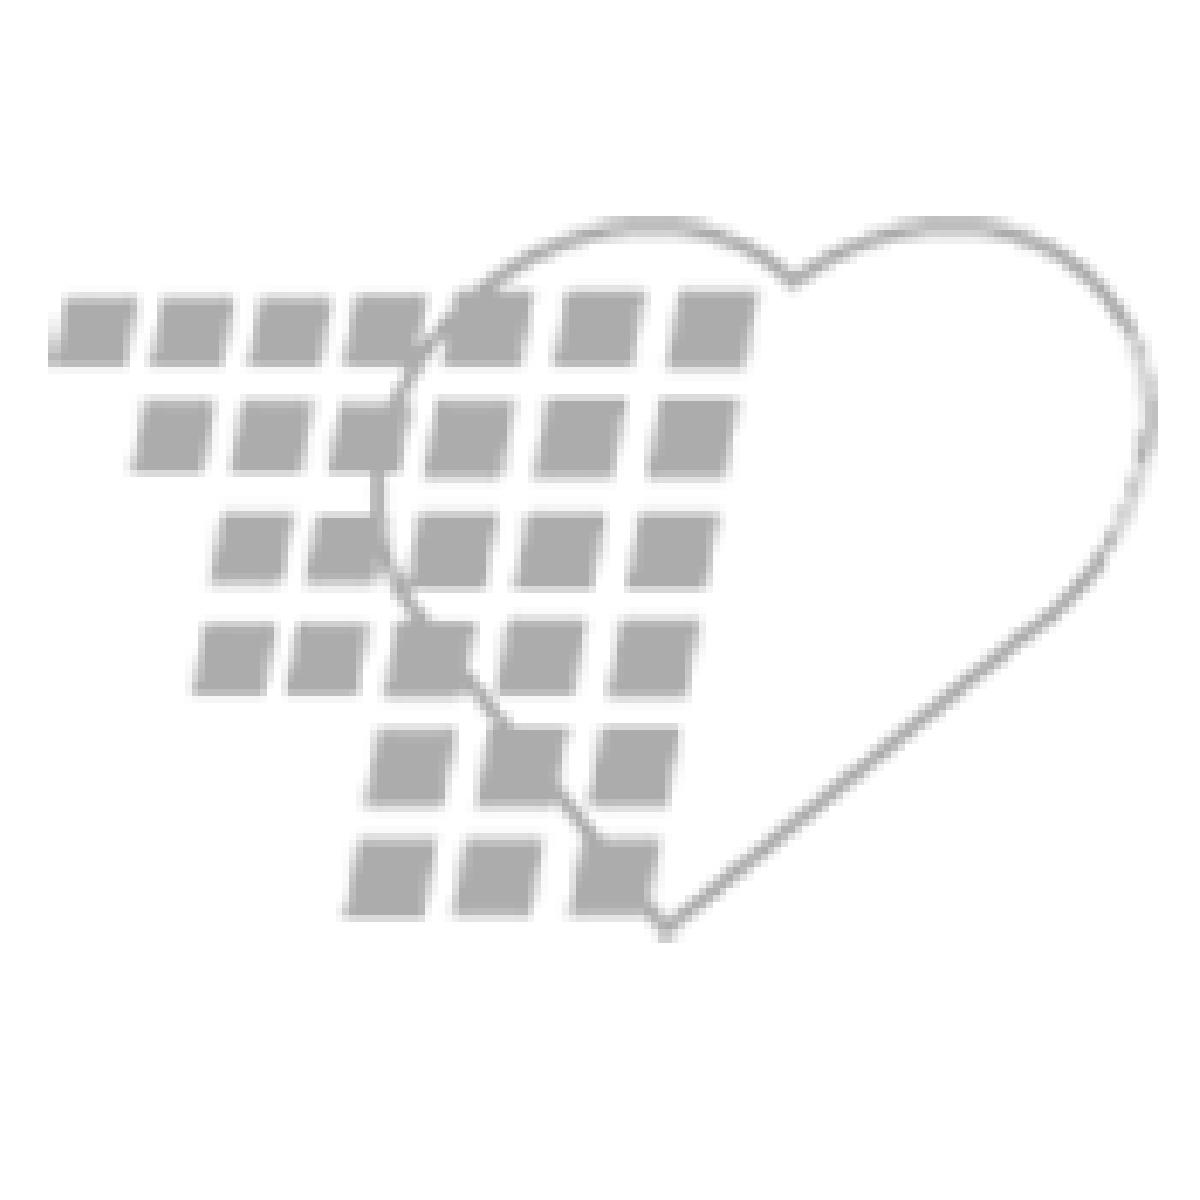 08-02-1414-16OZ - Povidone Iodine Prep Solution -16oz